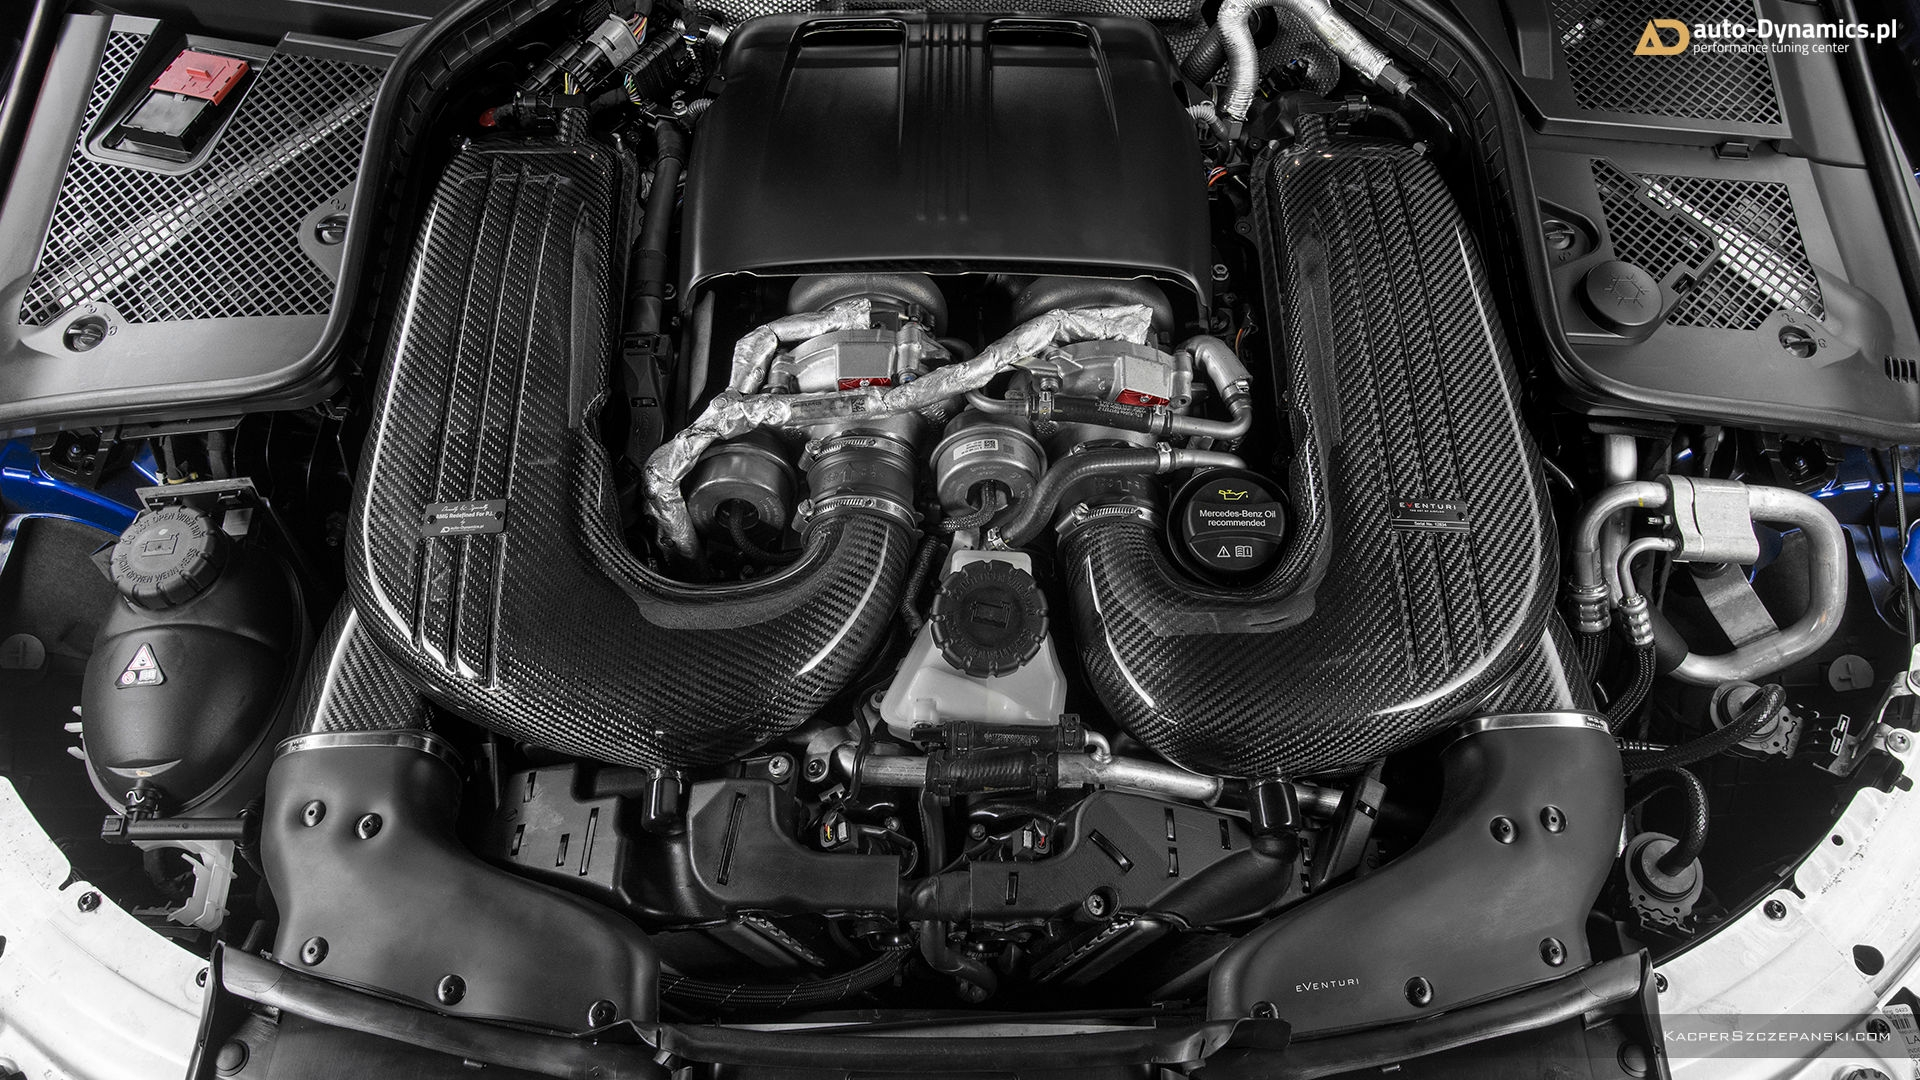 Mercedes-AMG C 63 S Auto Dynamics